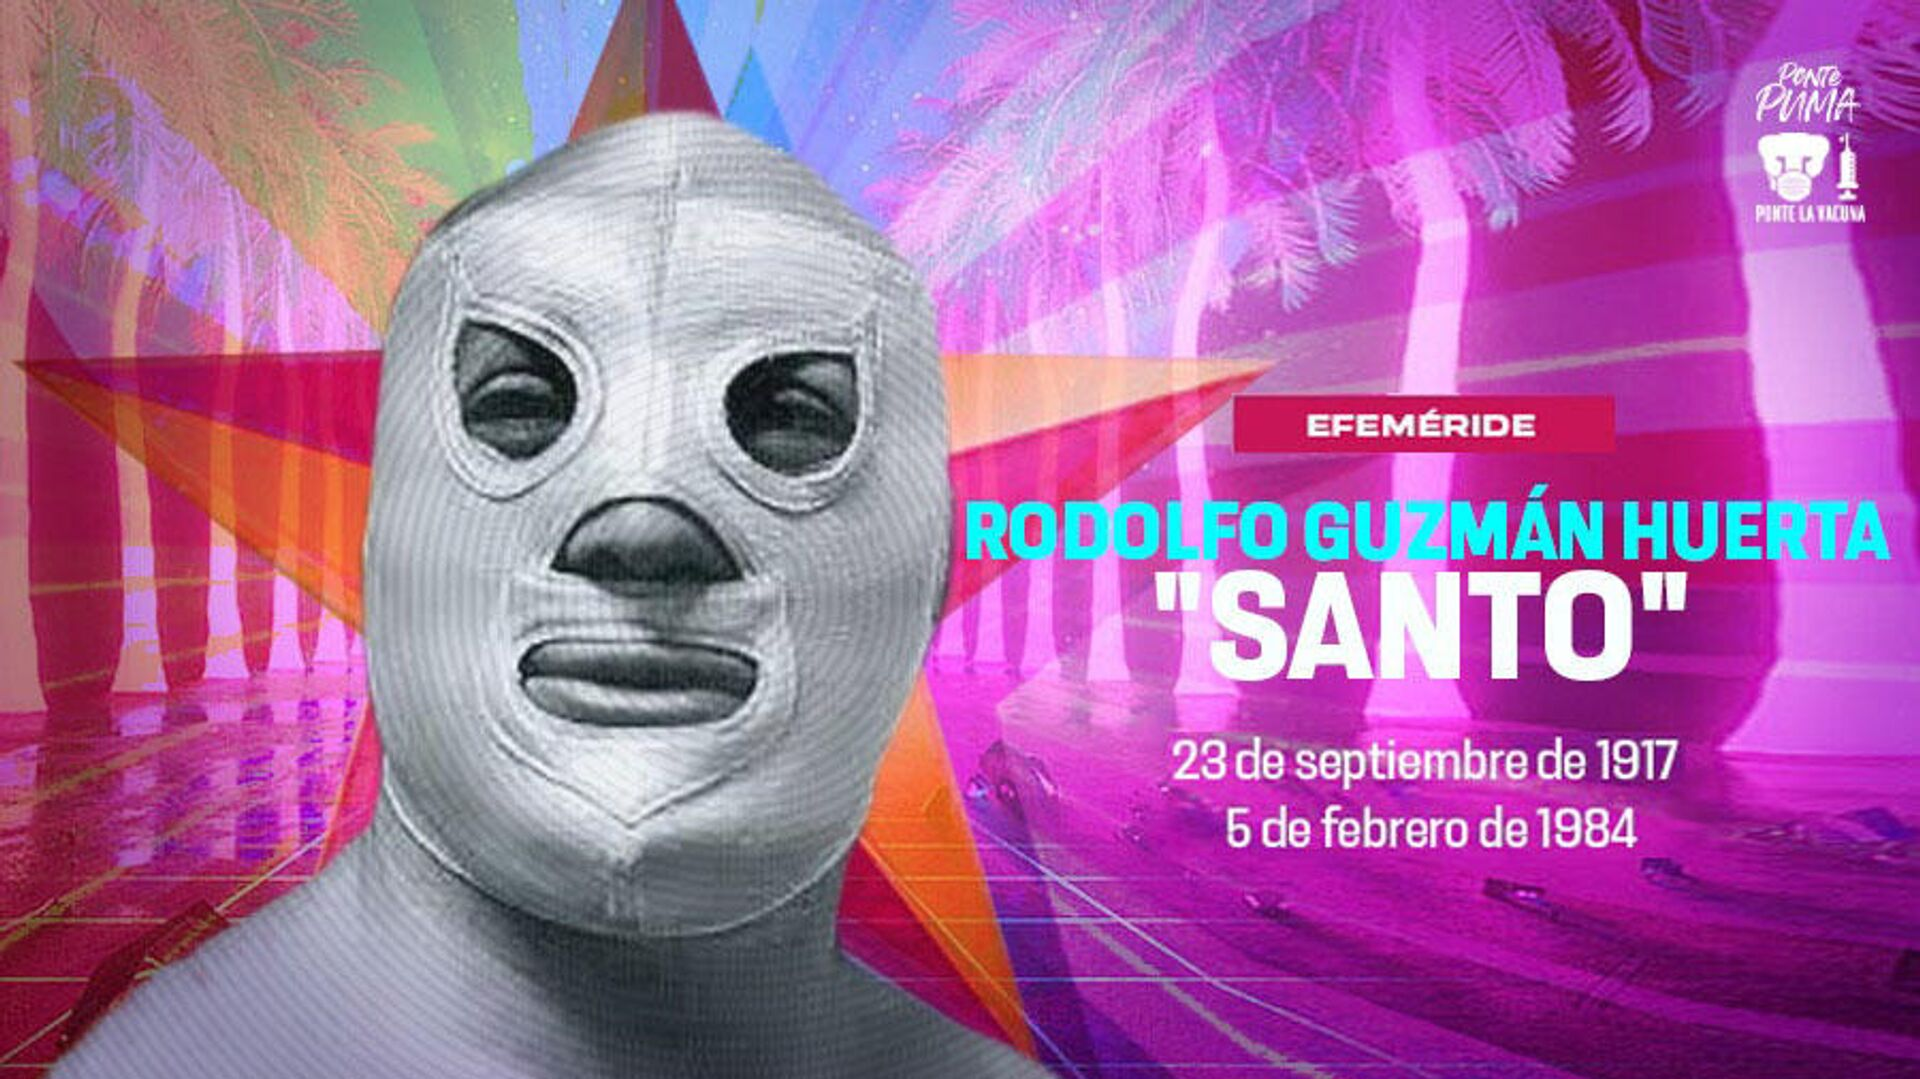 El Santo, el enmascarado de plata - Sputnik Mundo, 1920, 23.09.2021